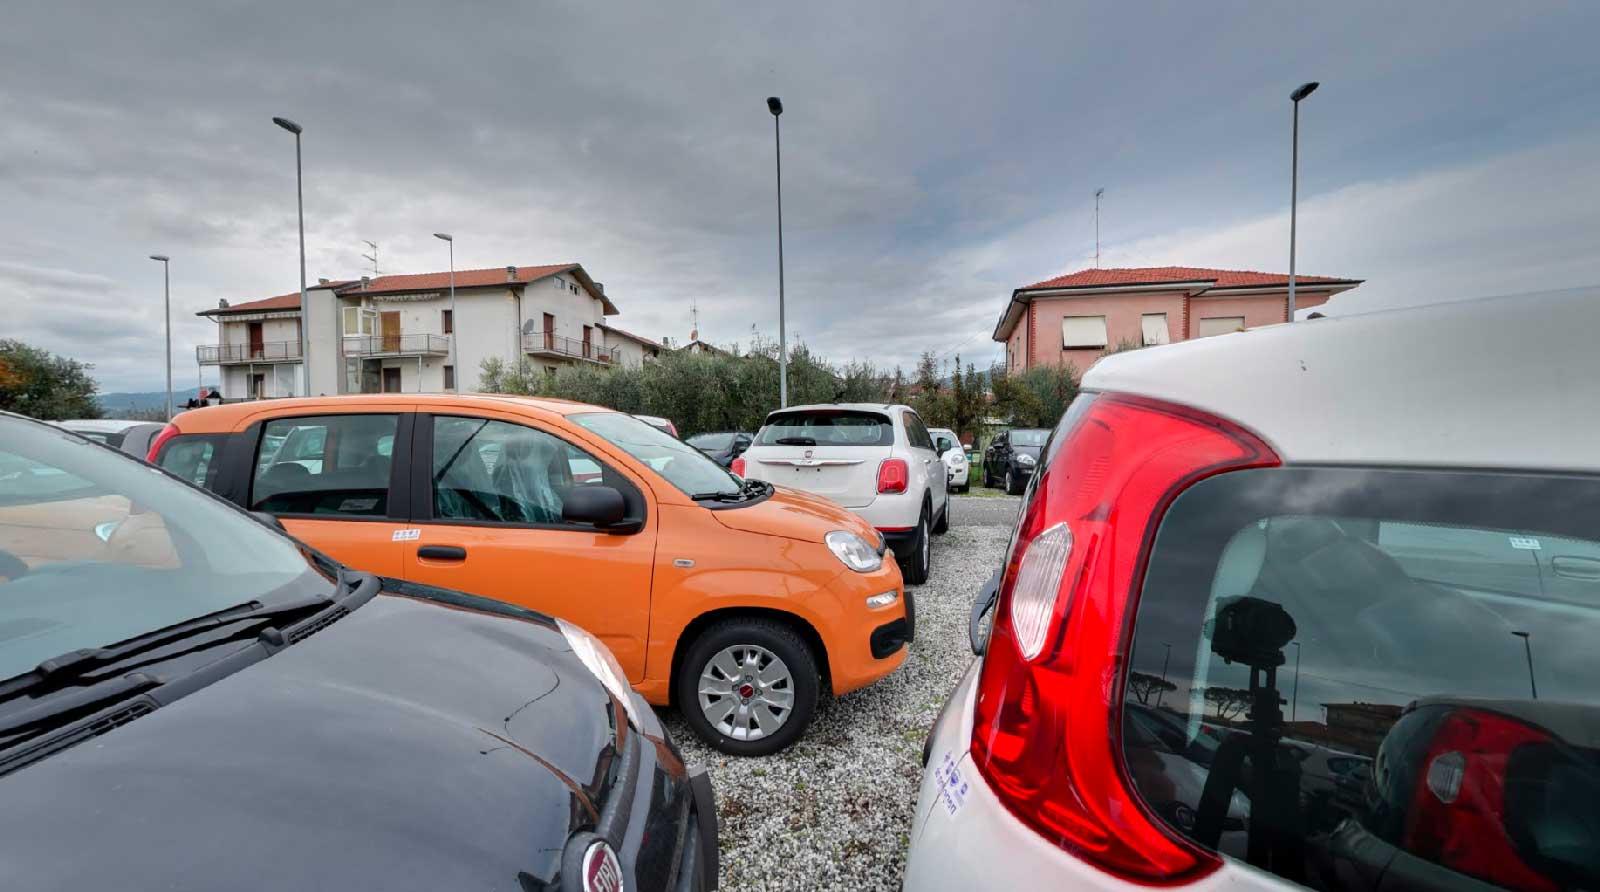 Simcar concessionario Fiat Santo Stefano Magra SP Servizio fotografico Google Street View